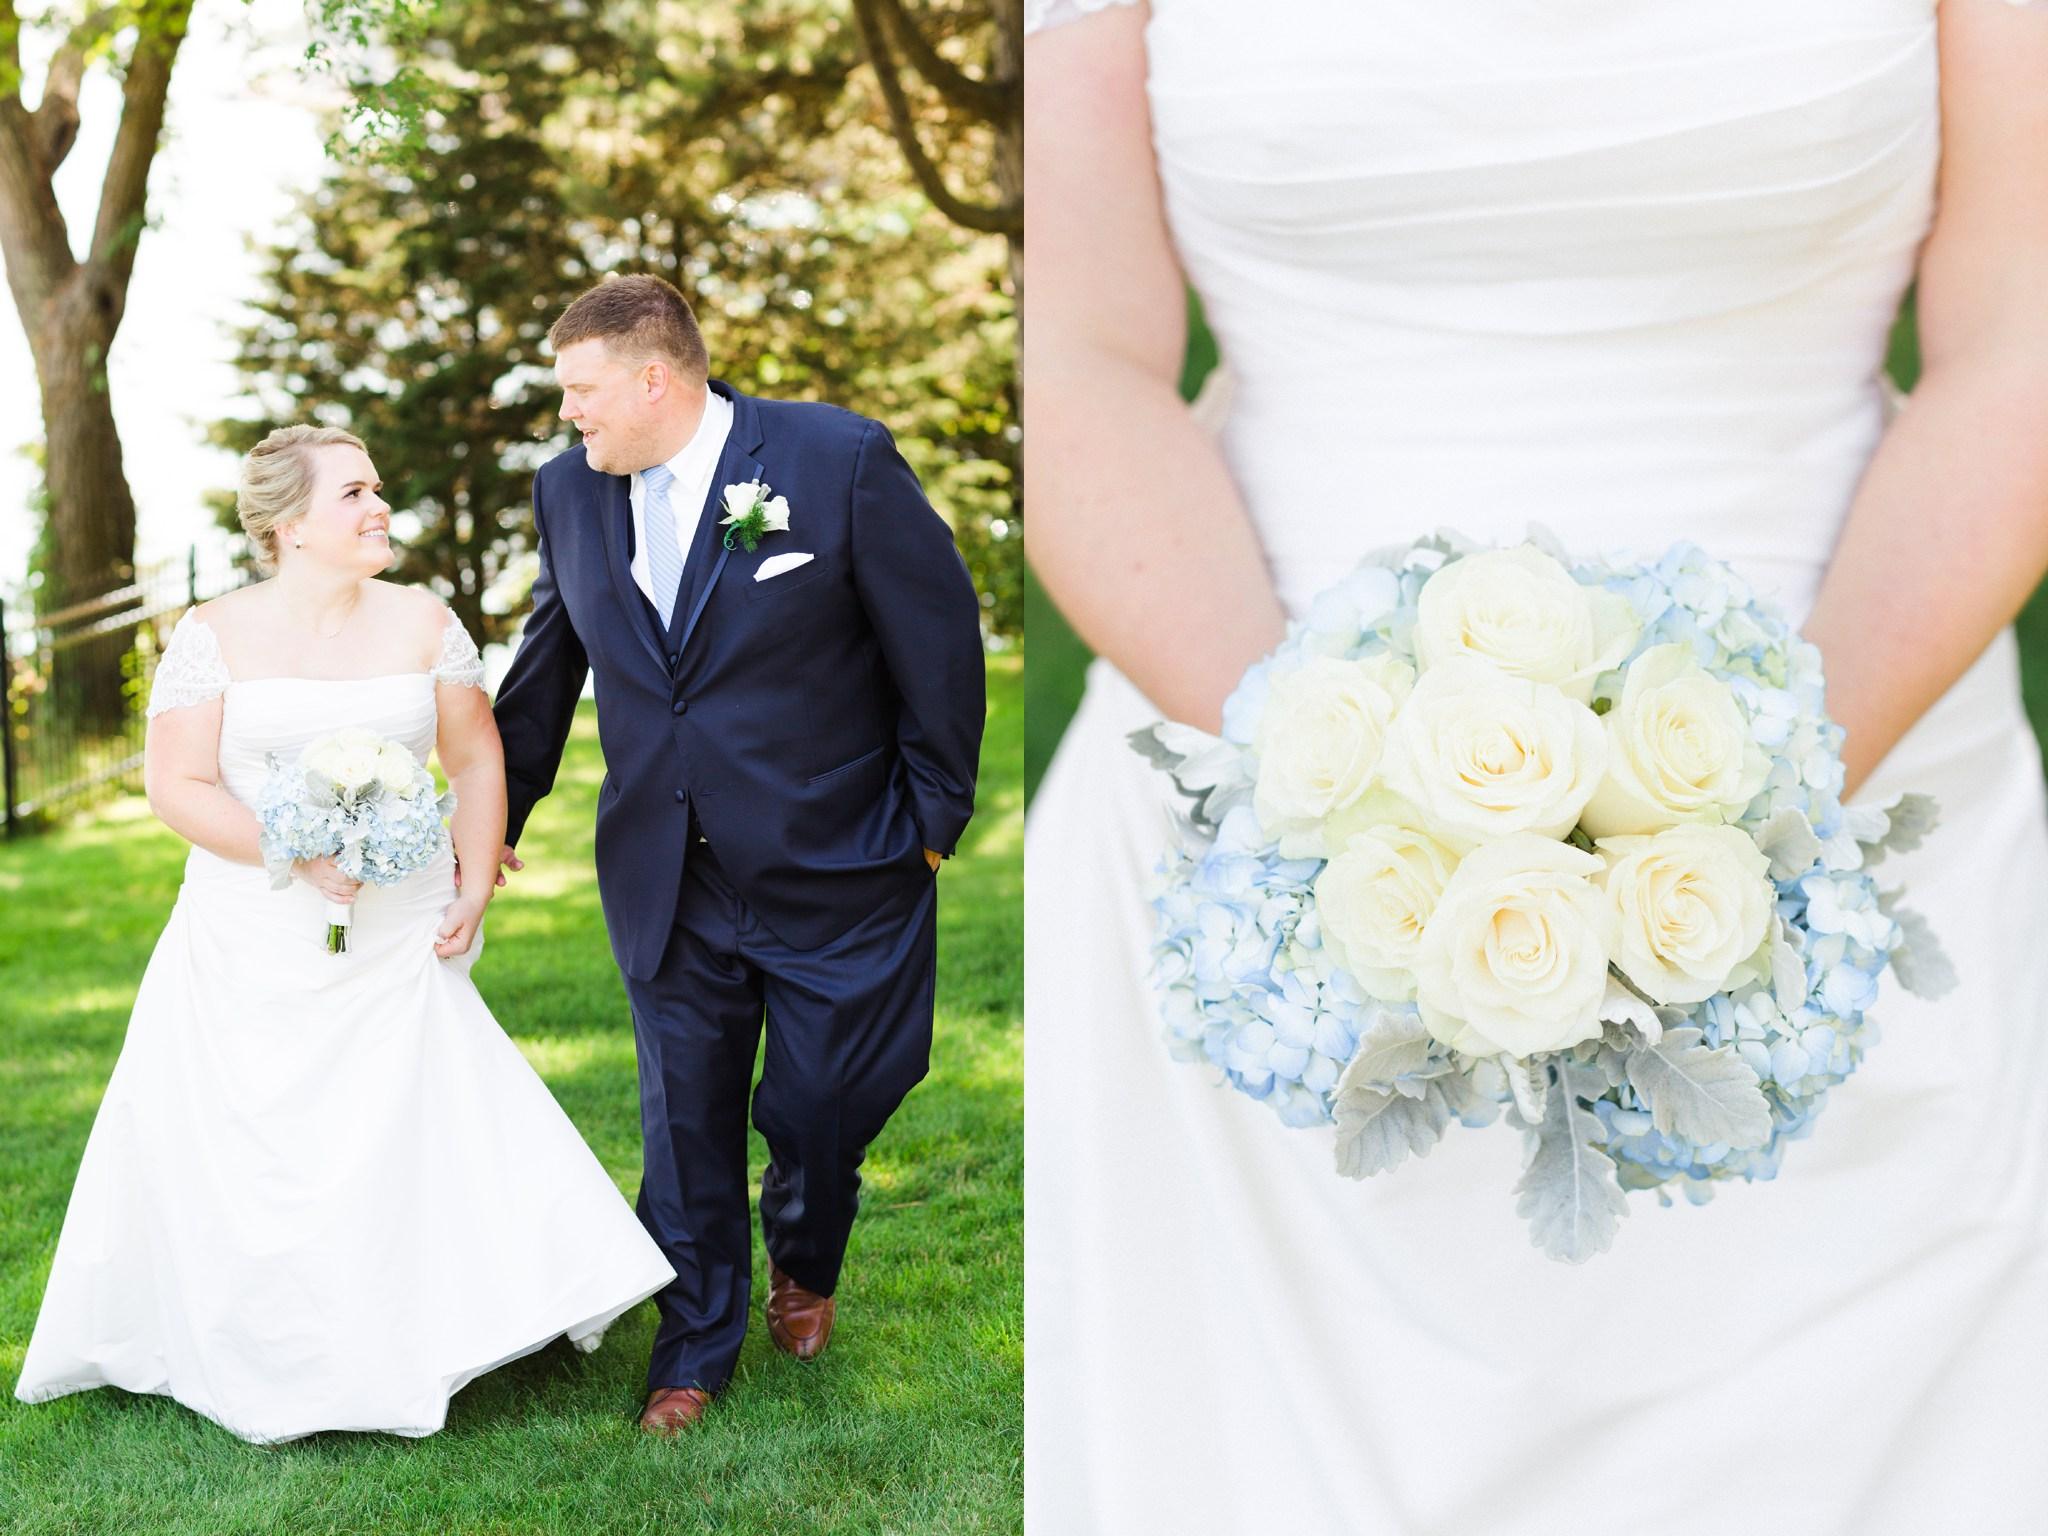 misselwood_endicott_college_wedding_photos_00026.JPG